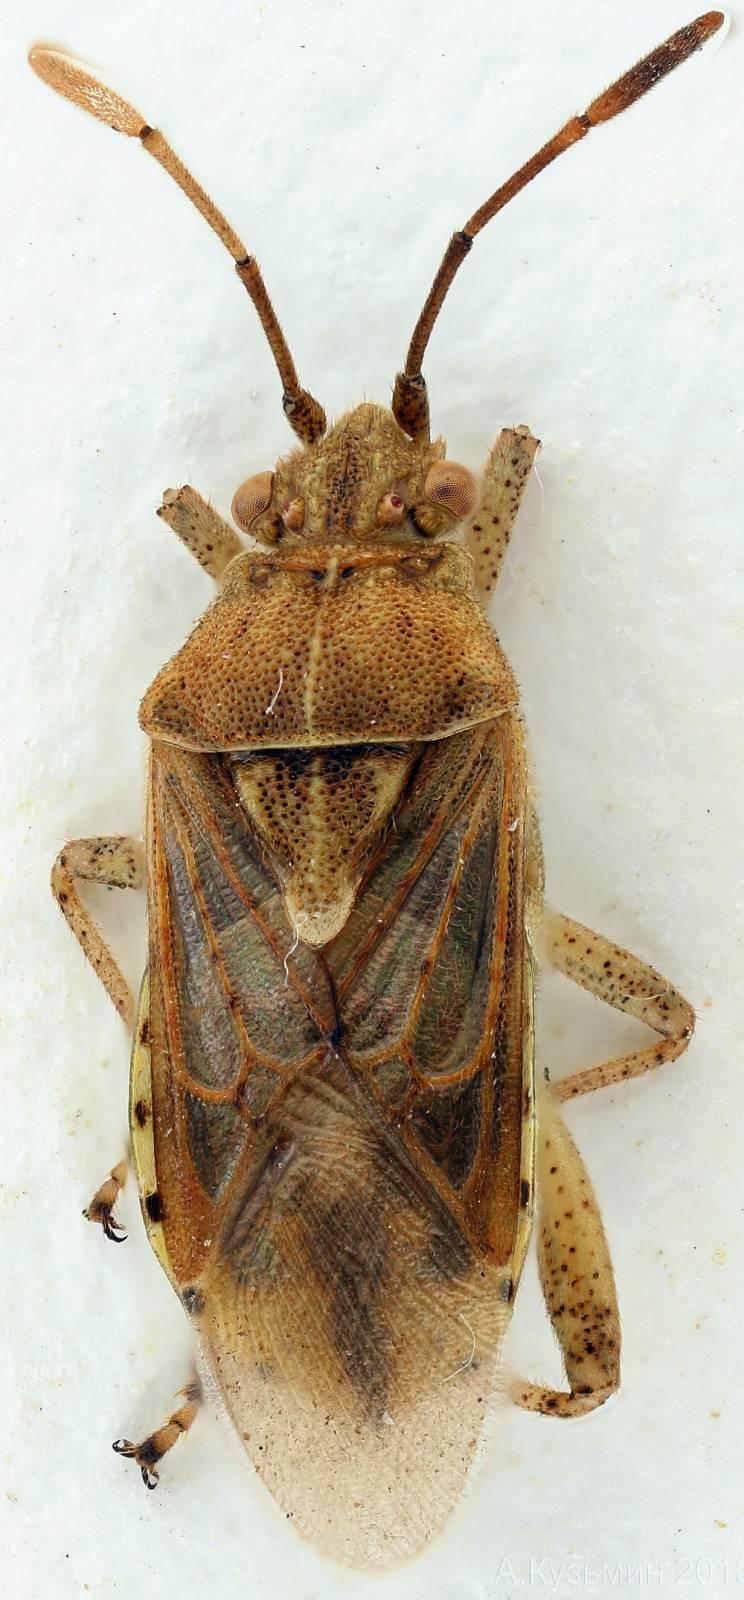 Булавник Stictopleurus sp.